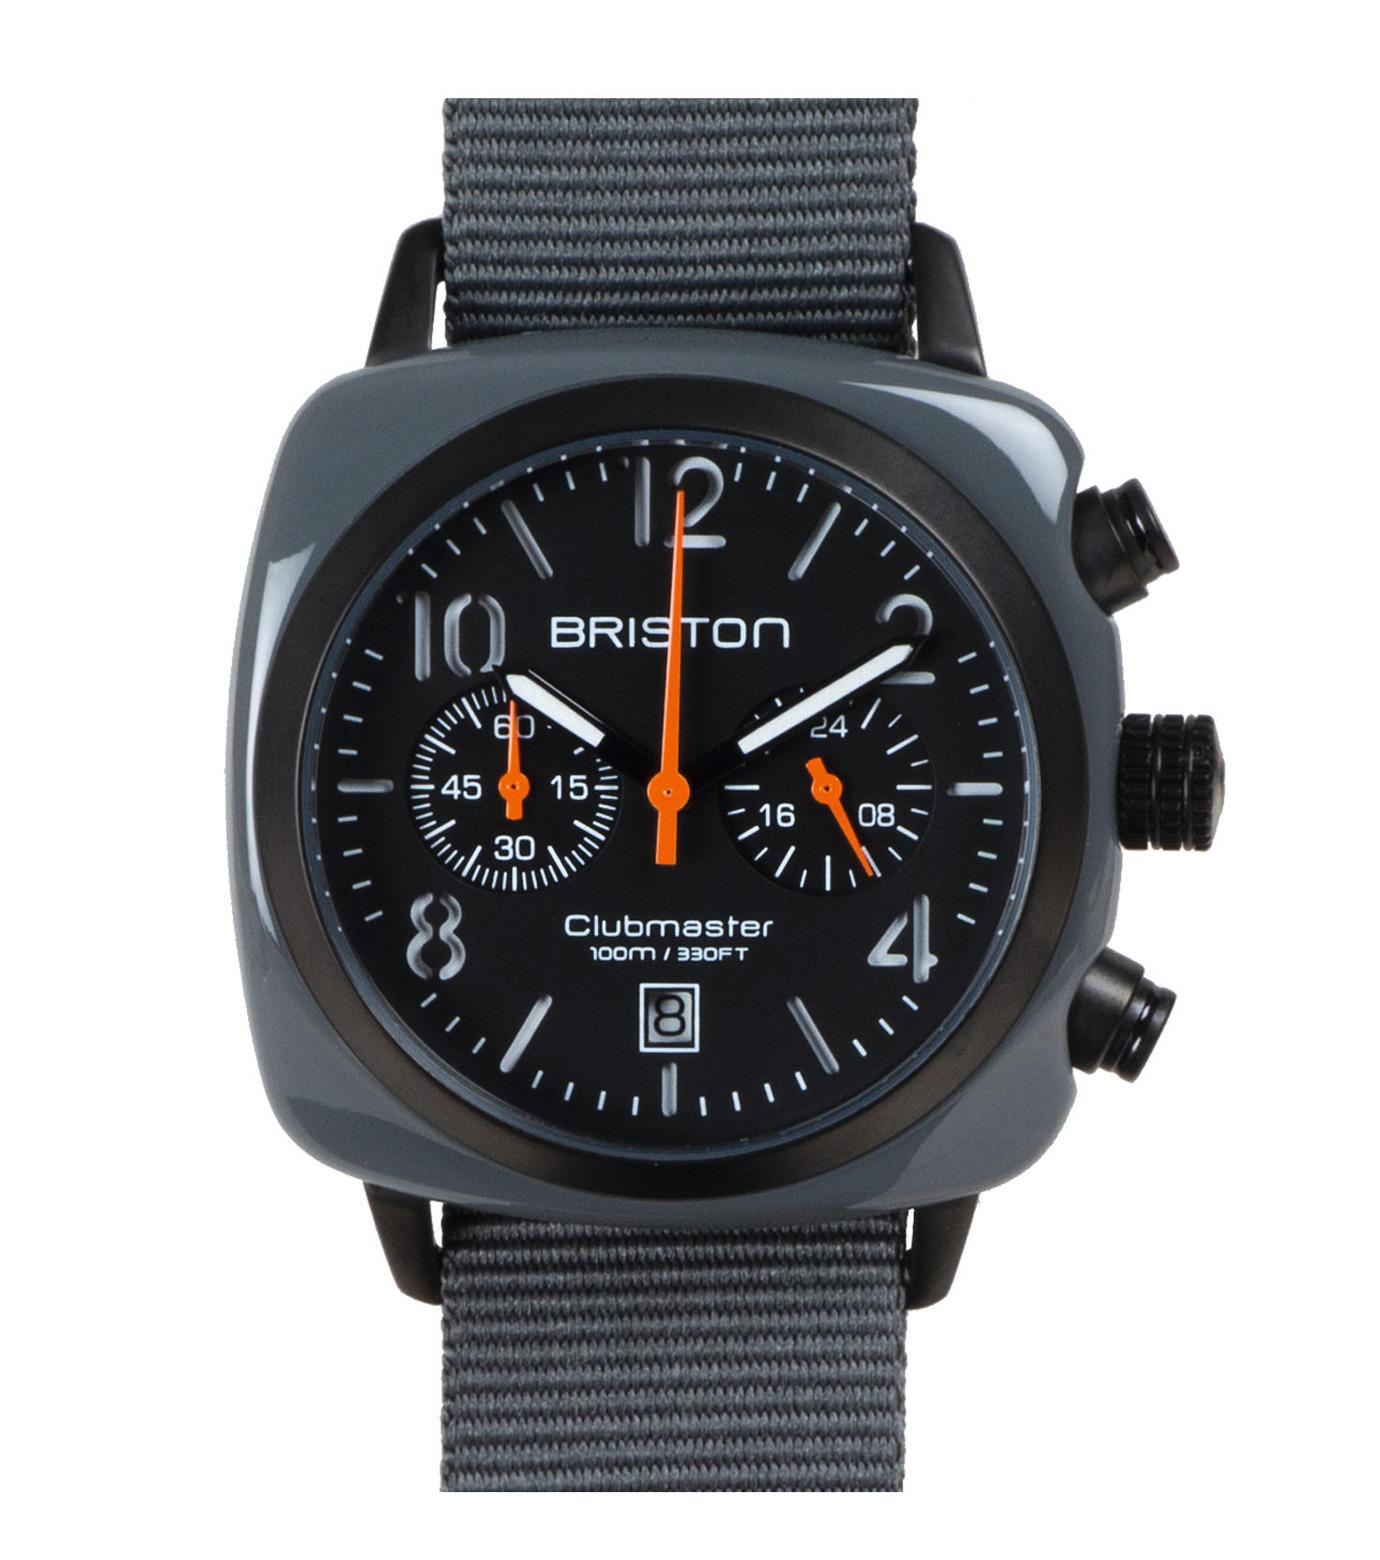 BRISTON(ブリストン)のCHRONO PVD-GRAY(ウォッチ/watch)-PVD-11 拡大詳細画像1